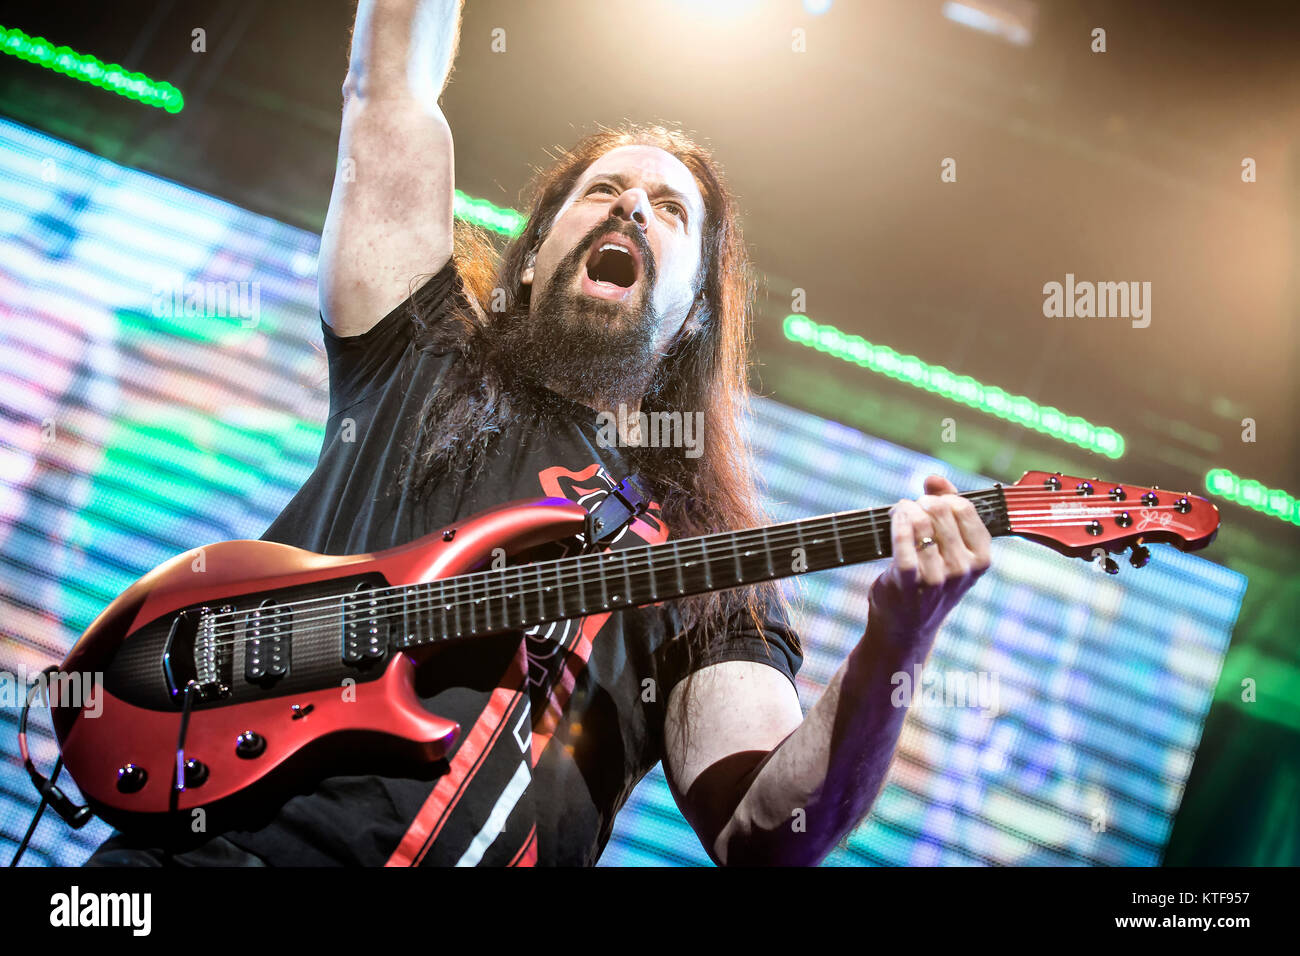 The American progressive metal band Dream Theater performs a live concert at Oslo Spektrum. Here guitarist John - Stock Image